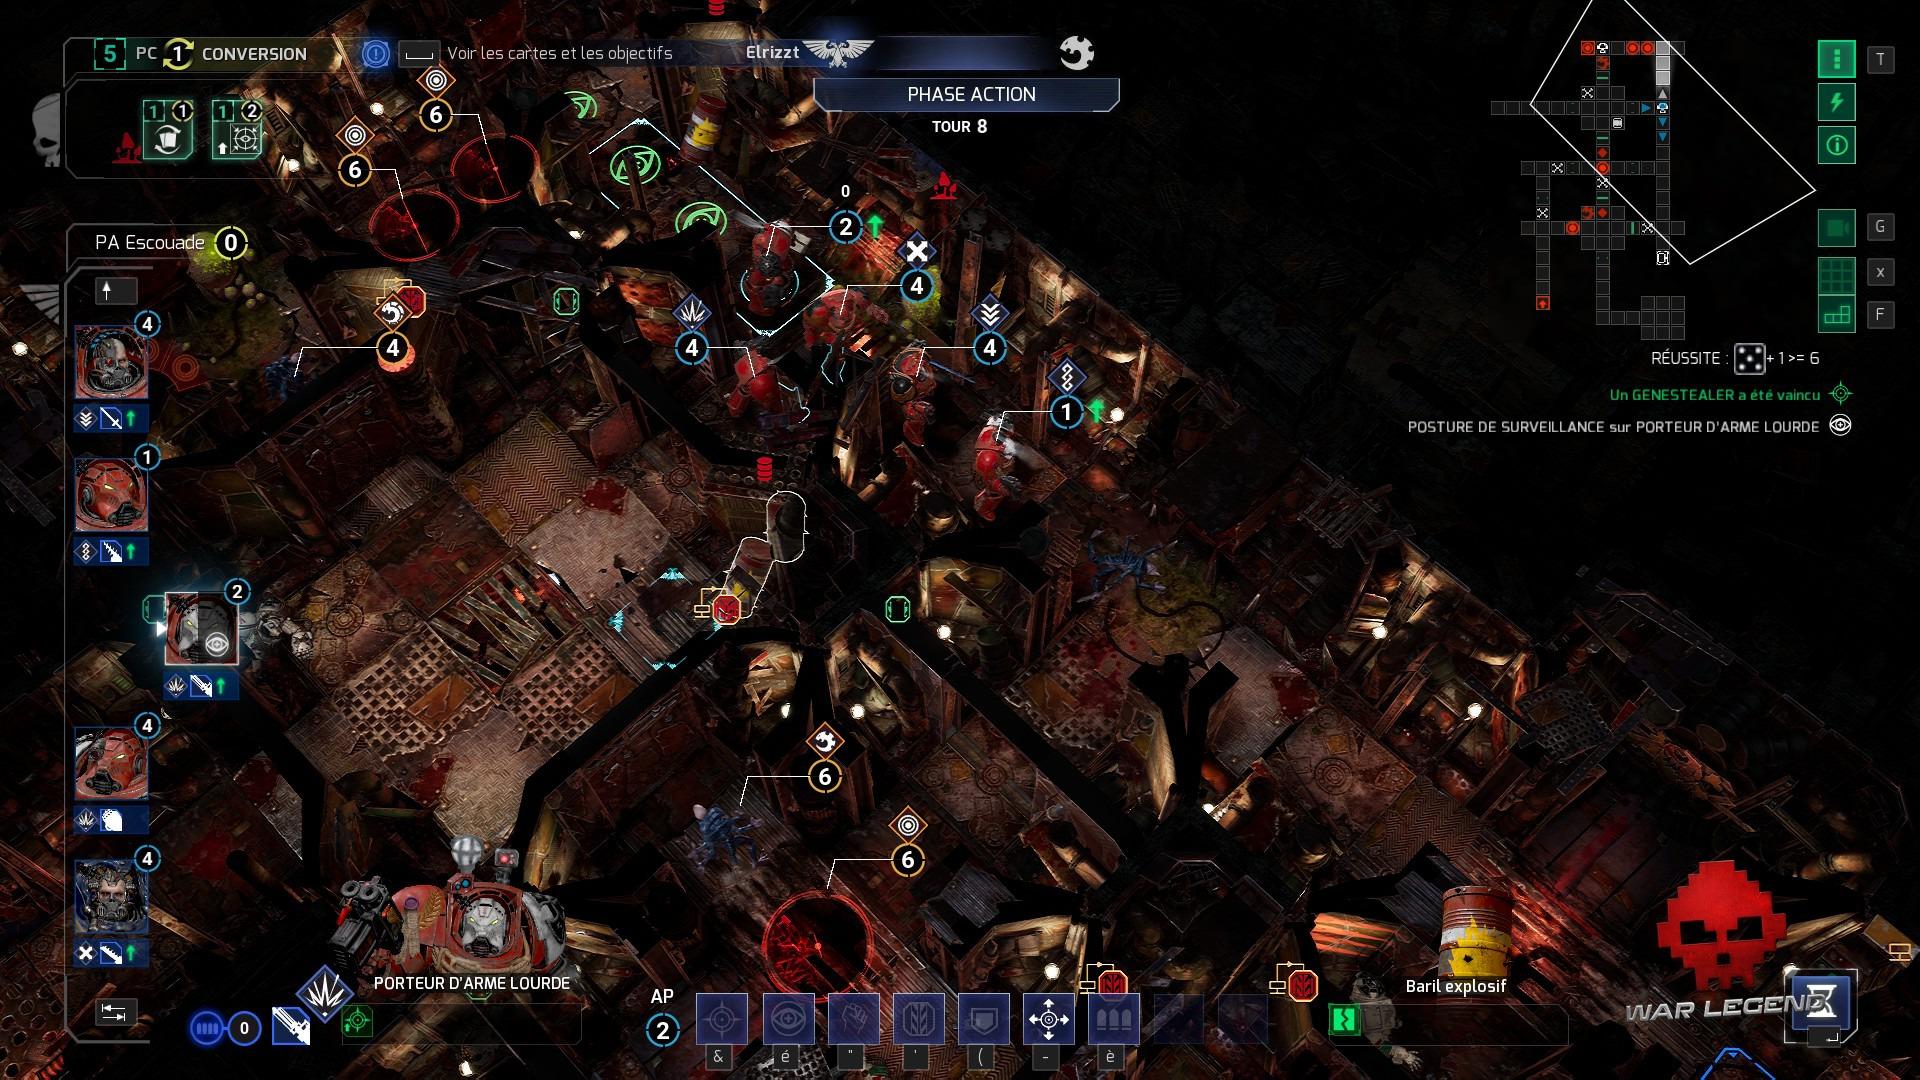 Matchmaking multijoueur XCom